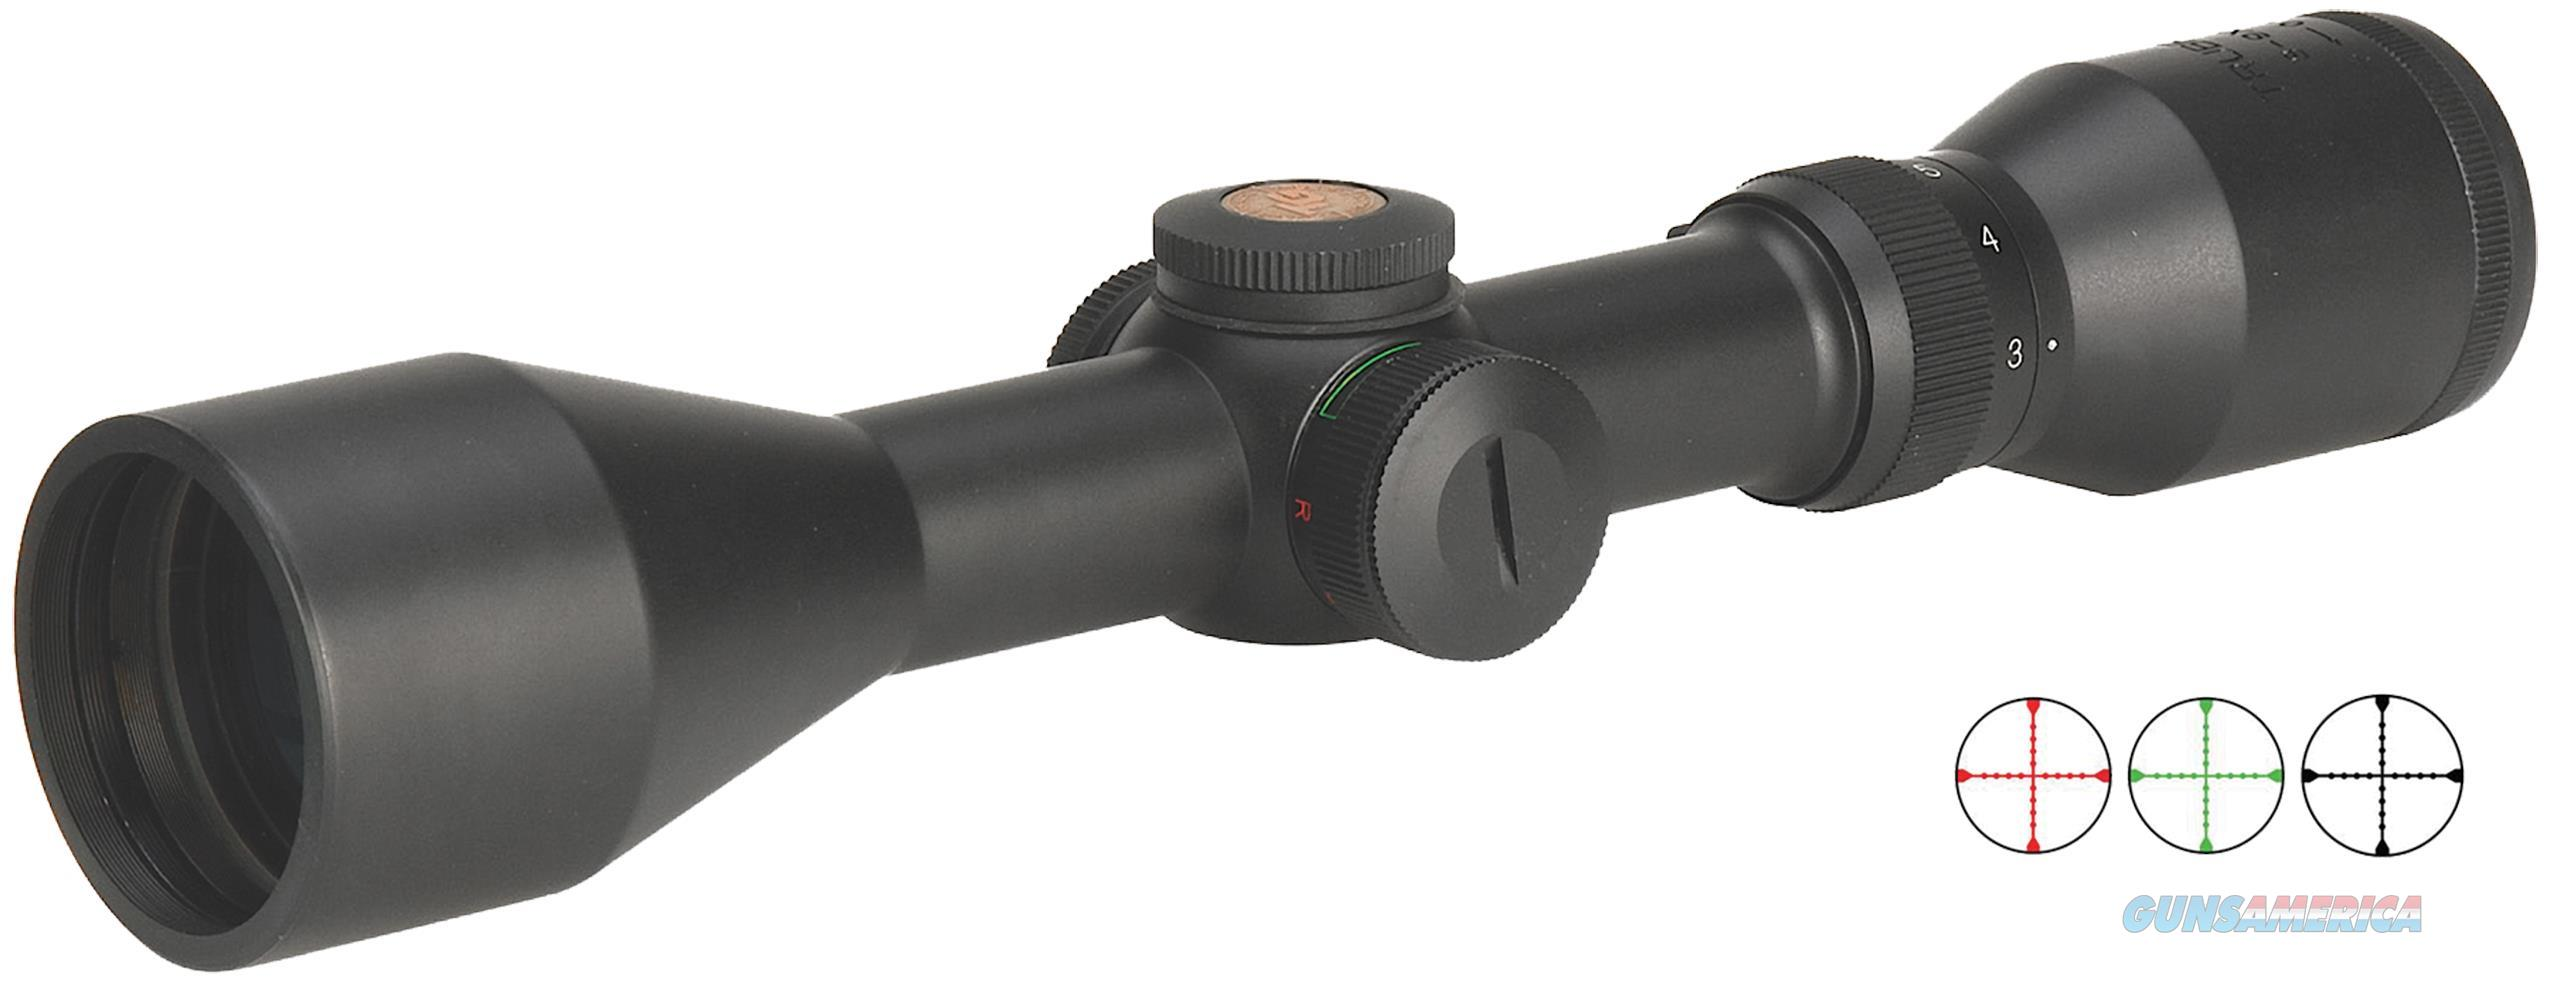 Truglo Tbx 3-9X44 Ir Shrt Bdc Blk TG8539BXB  Non-Guns > Scopes/Mounts/Rings & Optics > Rifle Scopes > Variable Focal Length